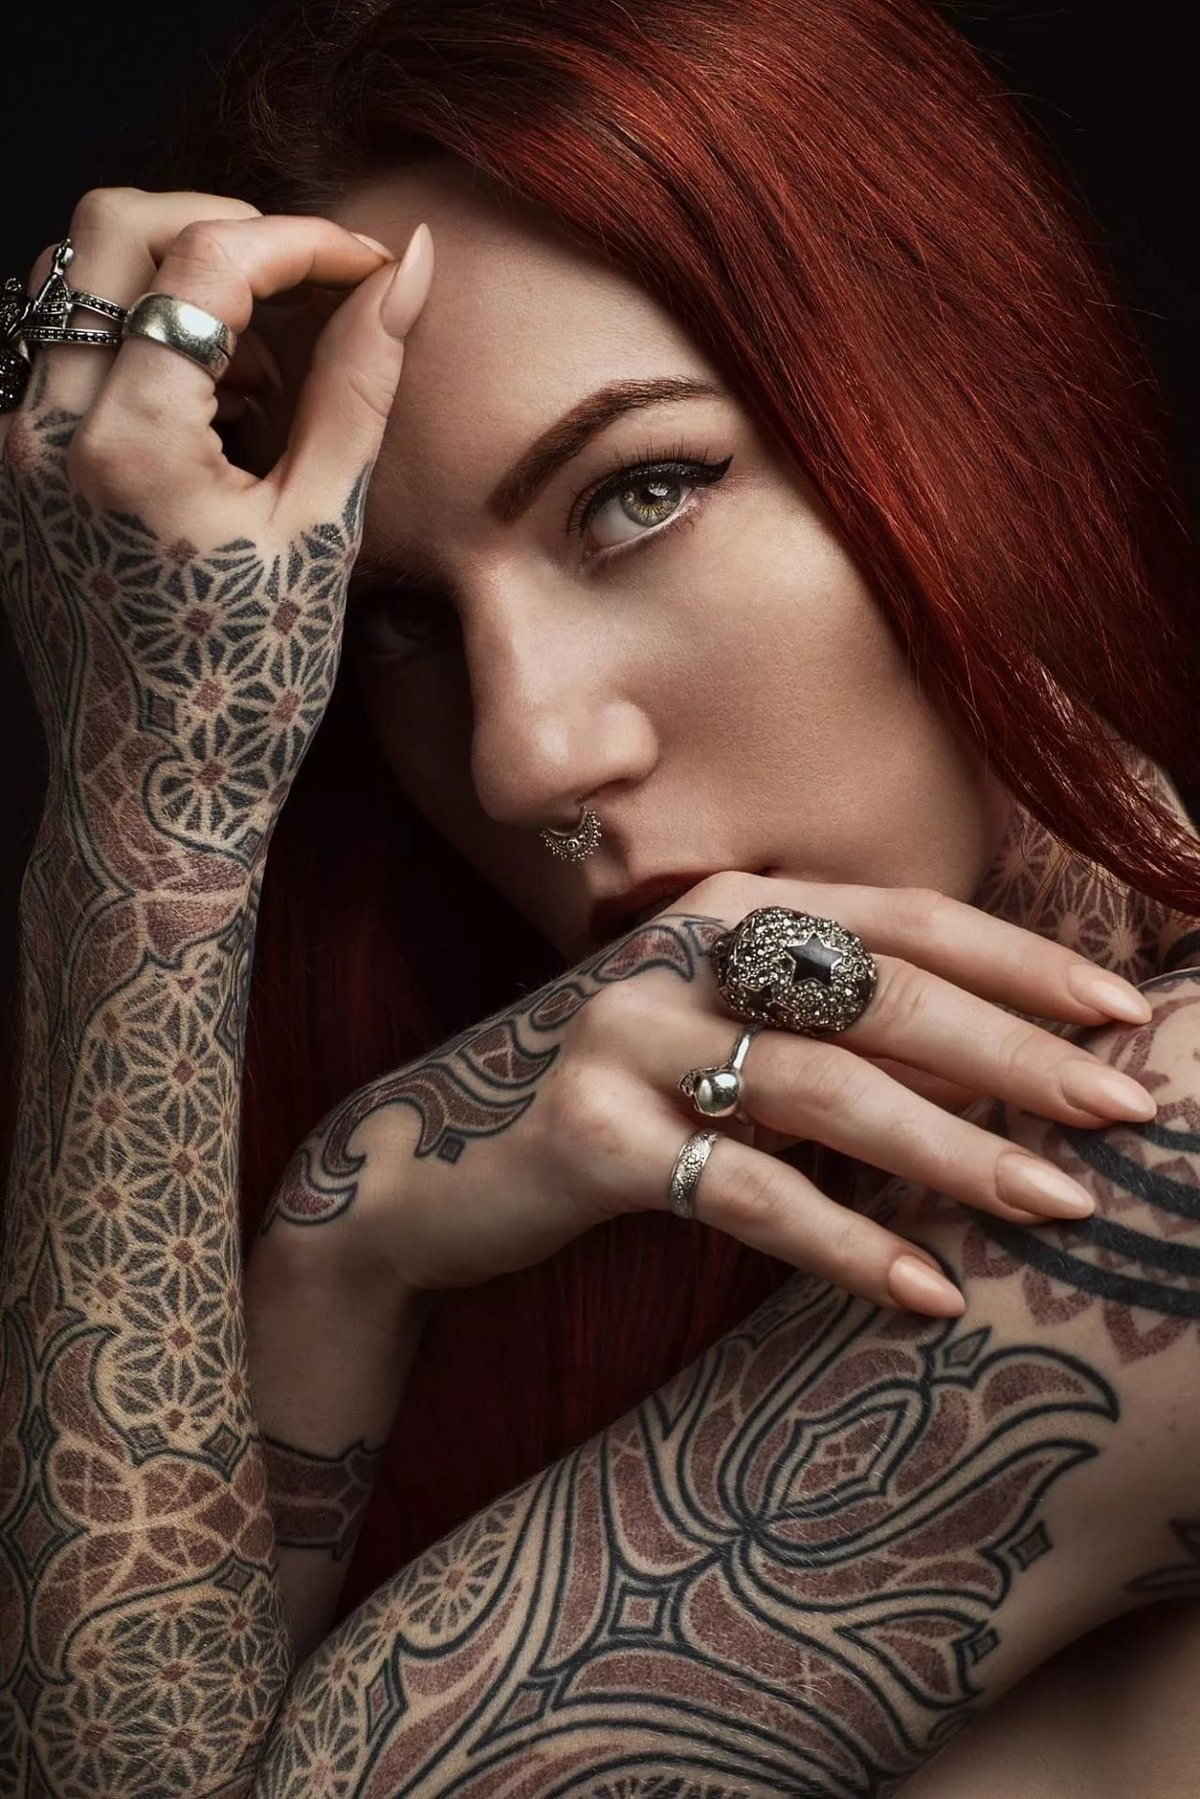 youngleaf-tattoo-girls-things